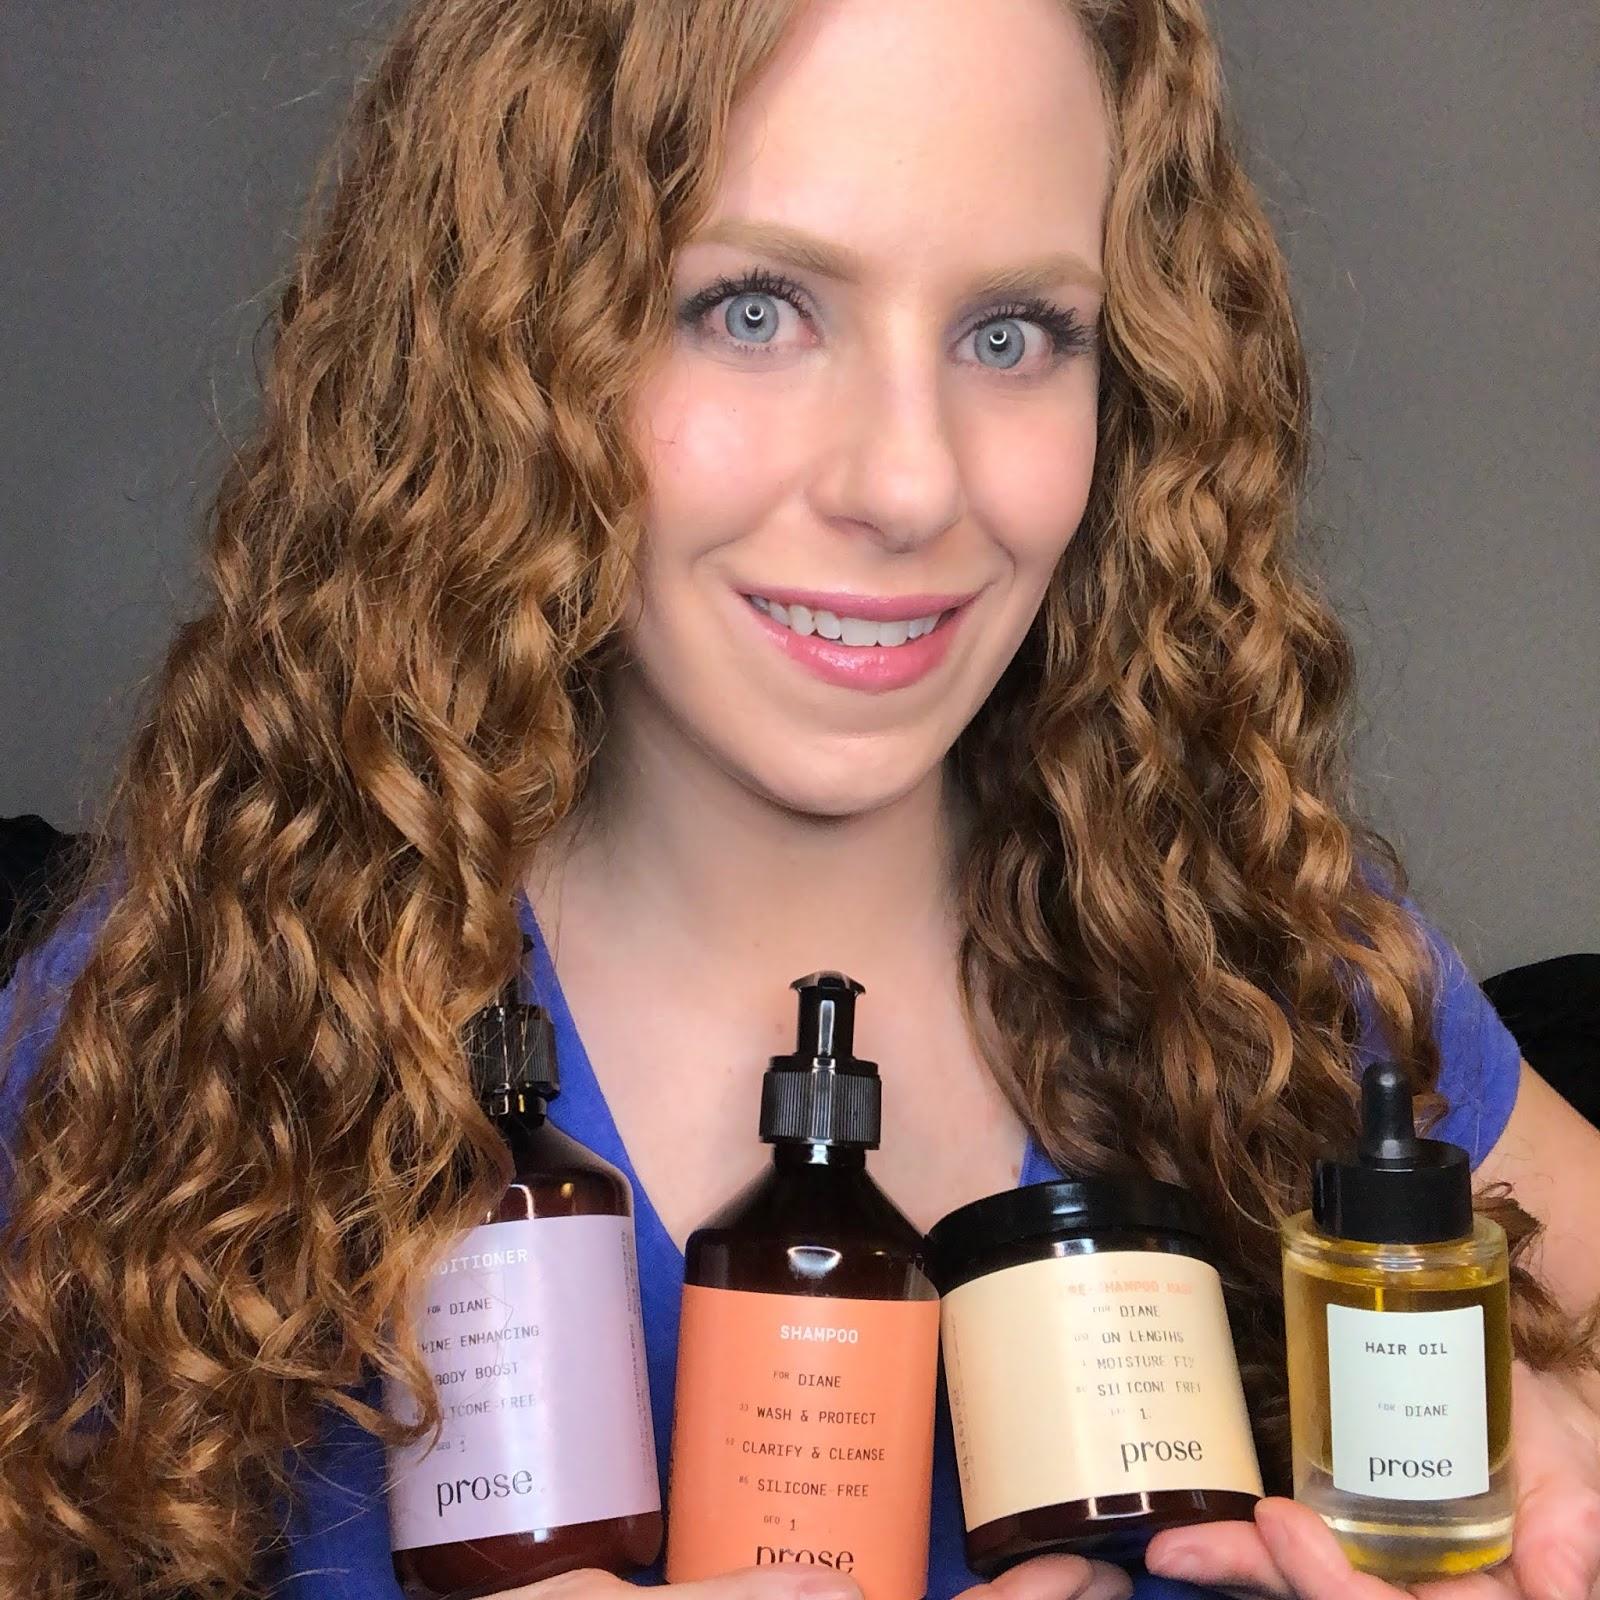 Prose Hair Care Reviews for Design Conscious Individuals